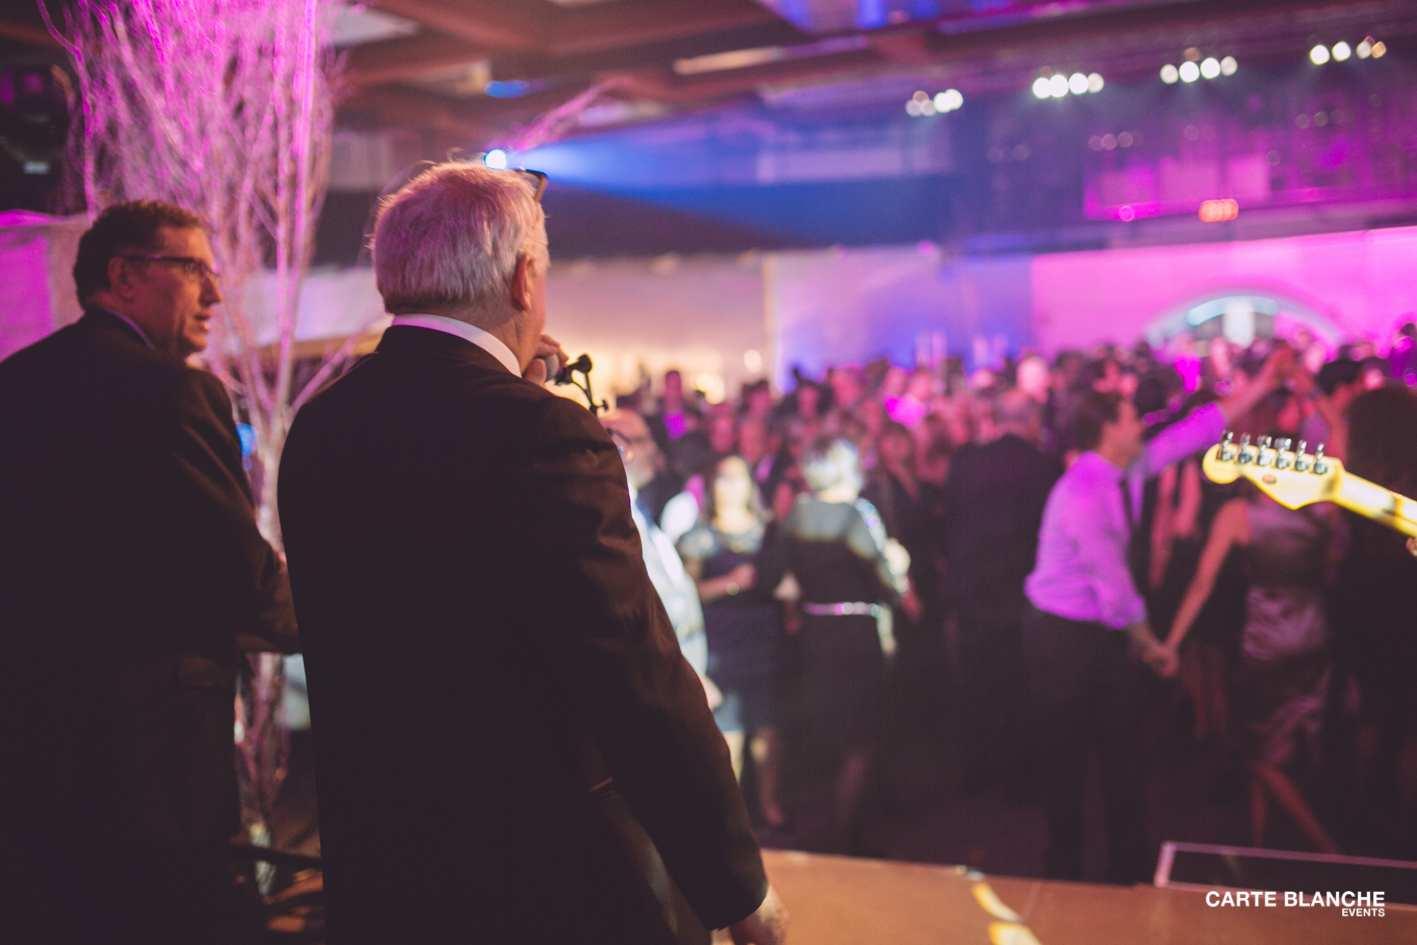 xmas-party-ferrero-2013-chanteur-musique-carte-blanche